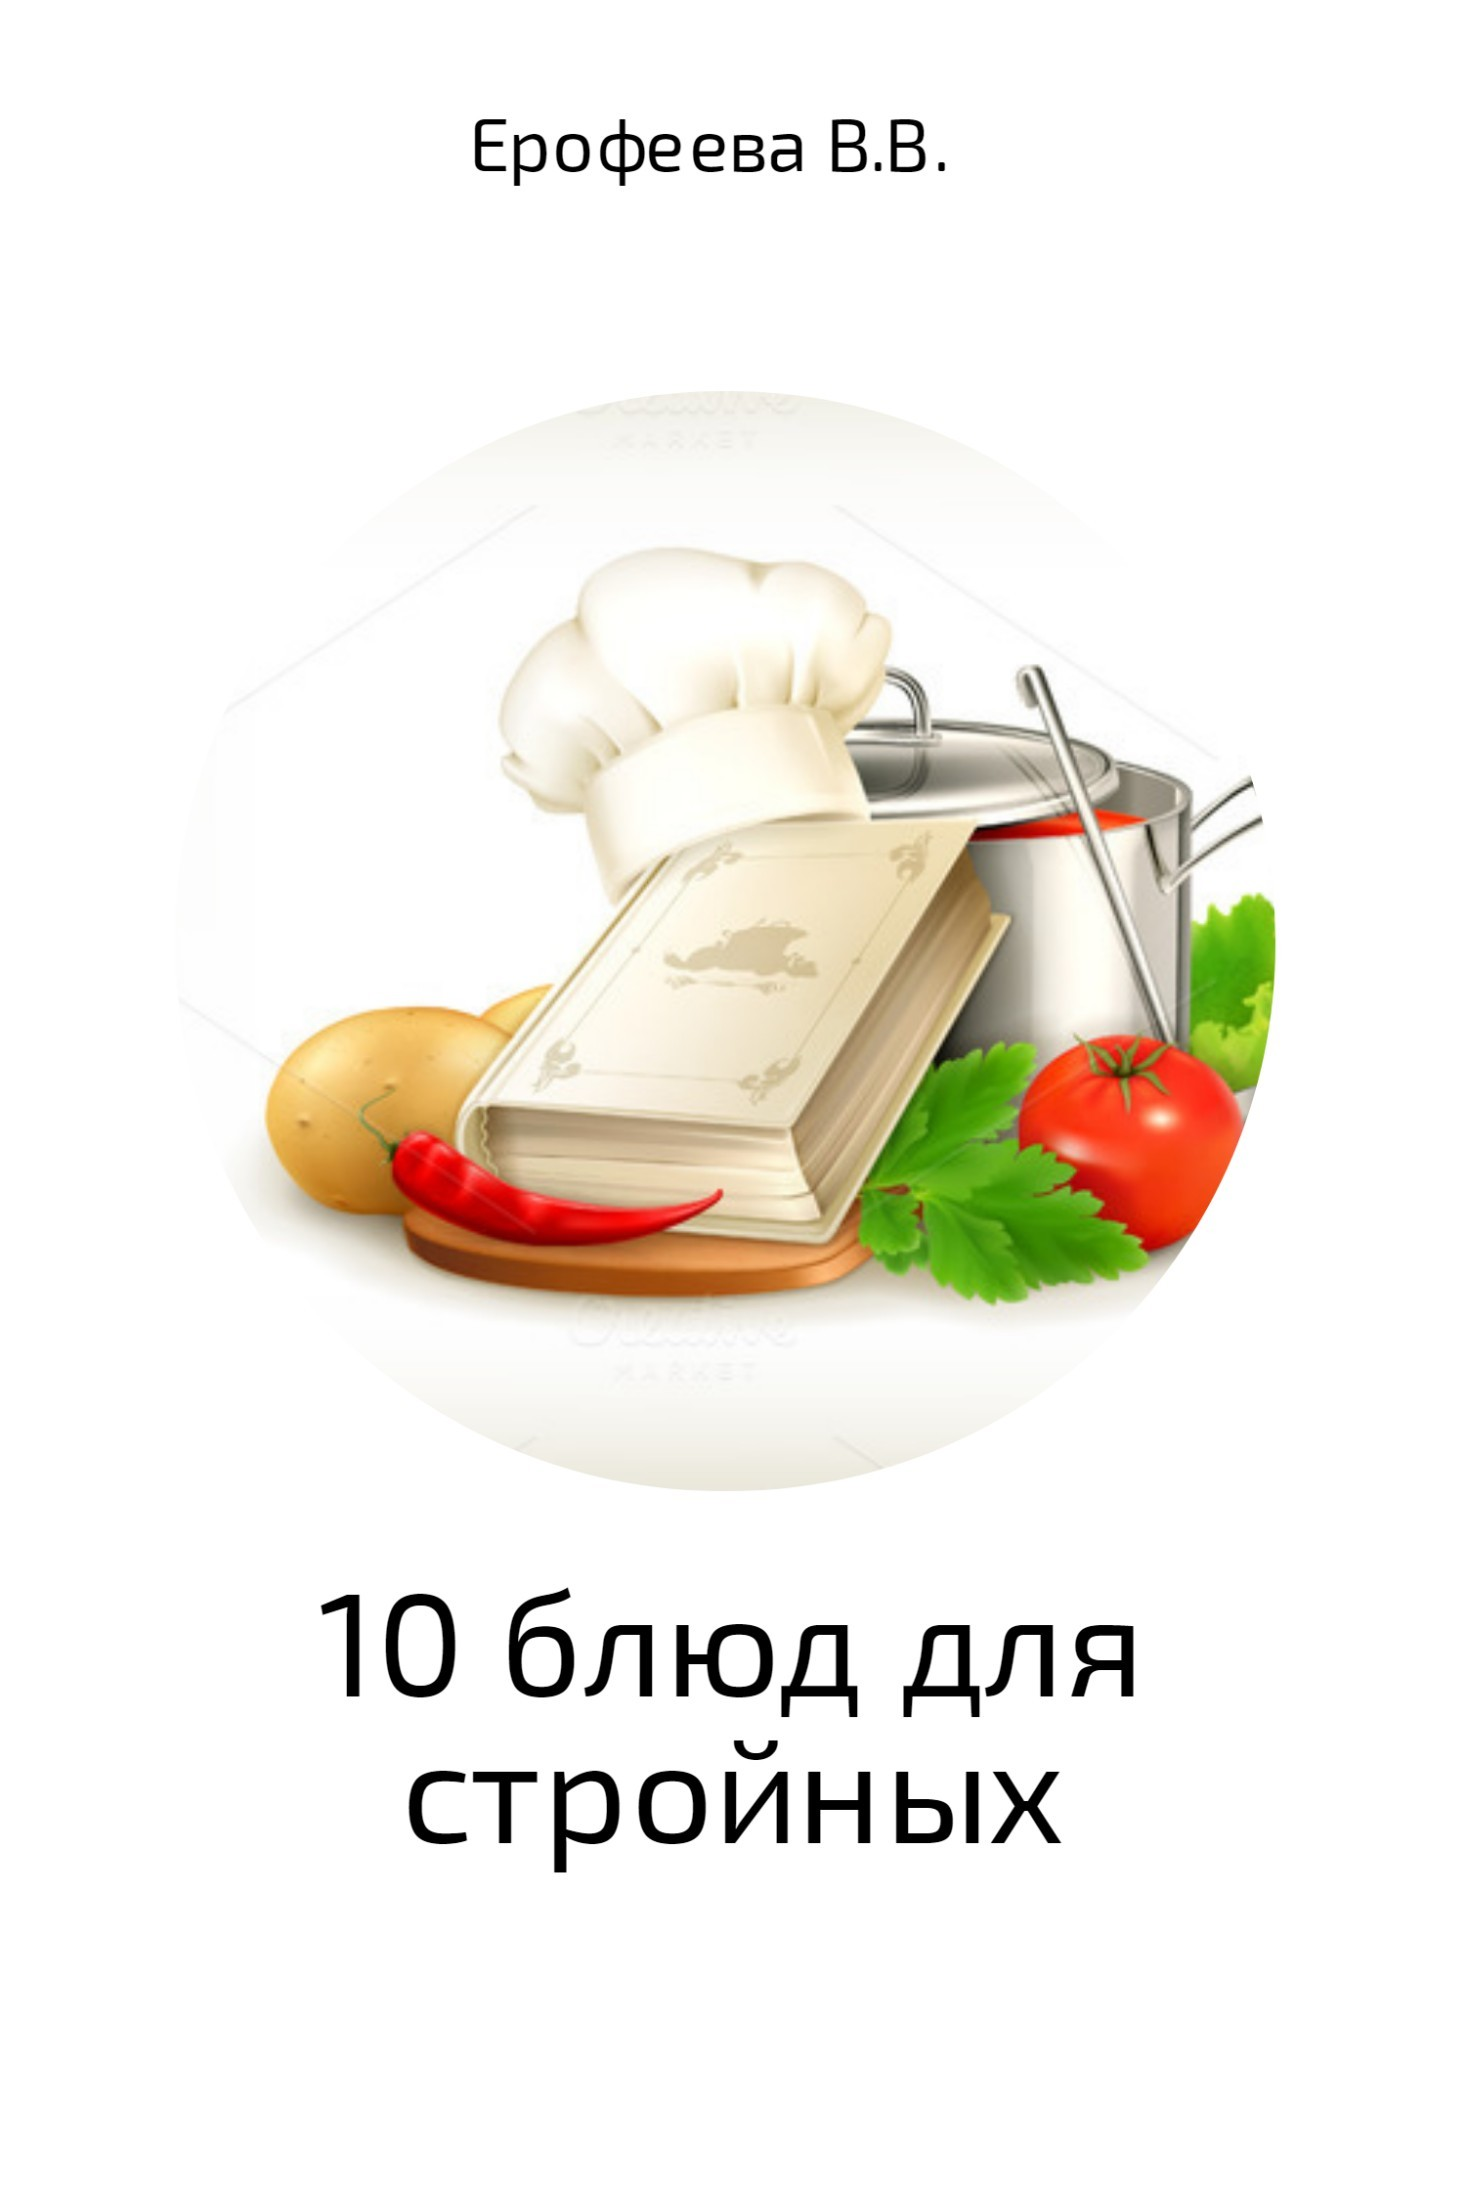 Валентина Владимировна Ерофеева бесплатно